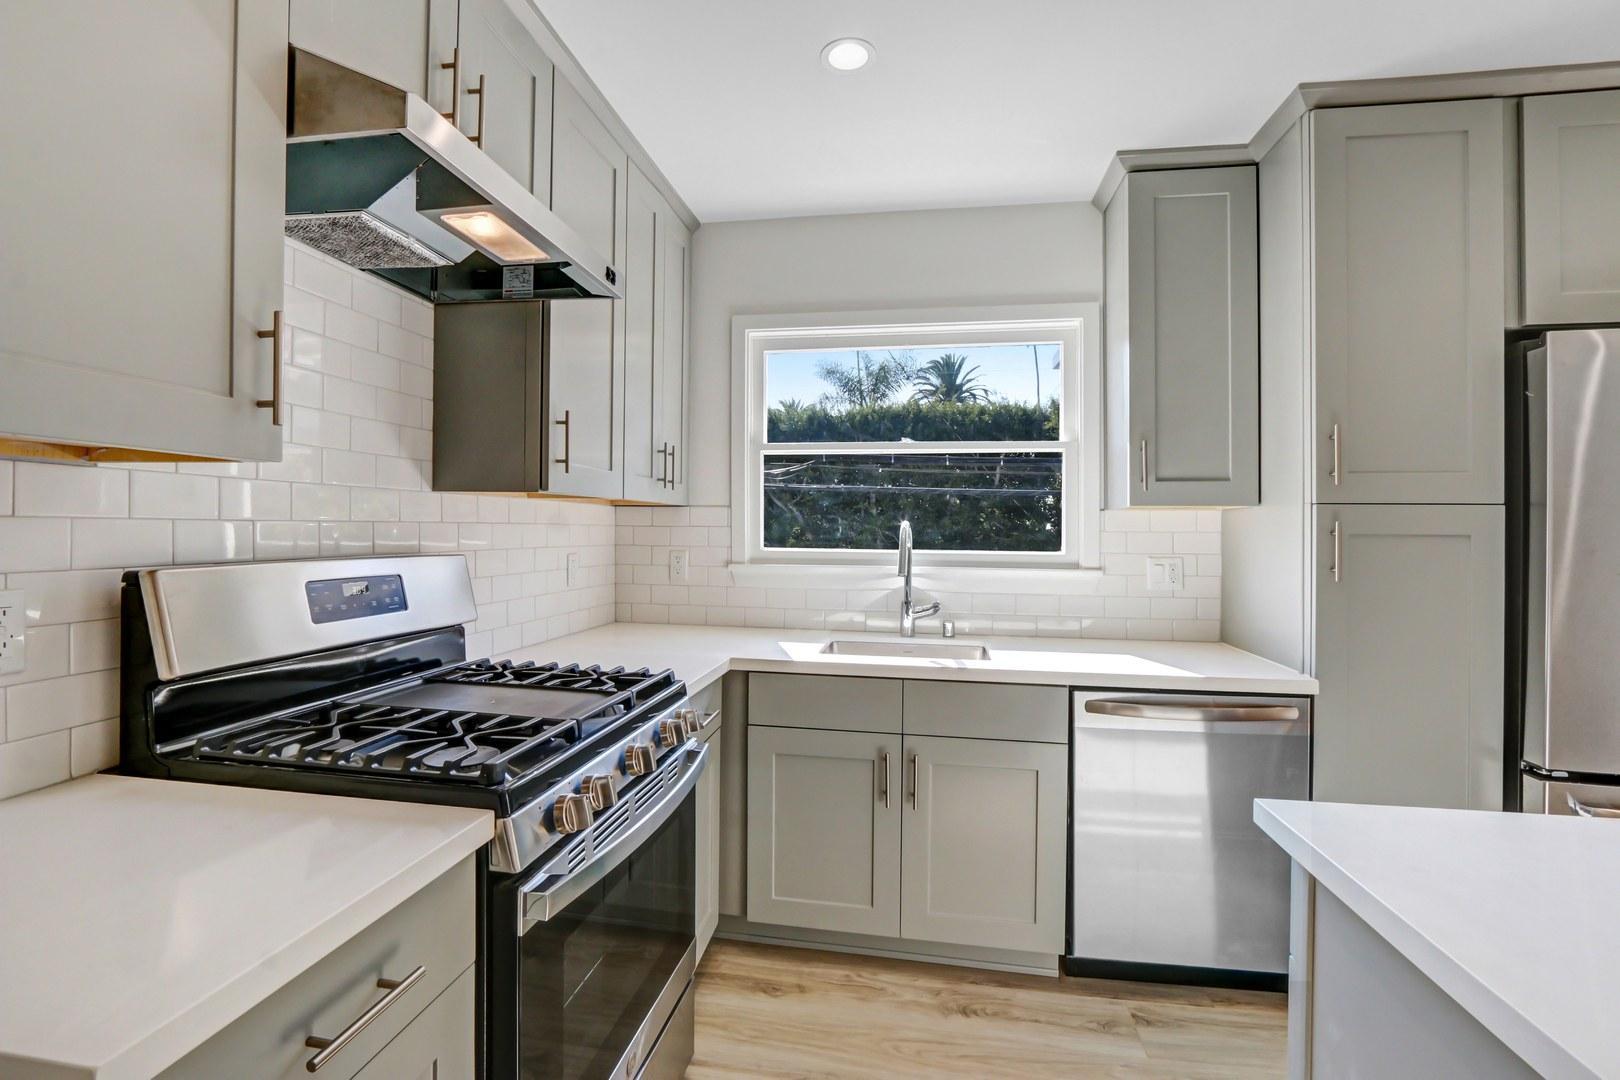 814-818 2nd Street #818-J, Santa Monica, CA - $4,095 USD/ month